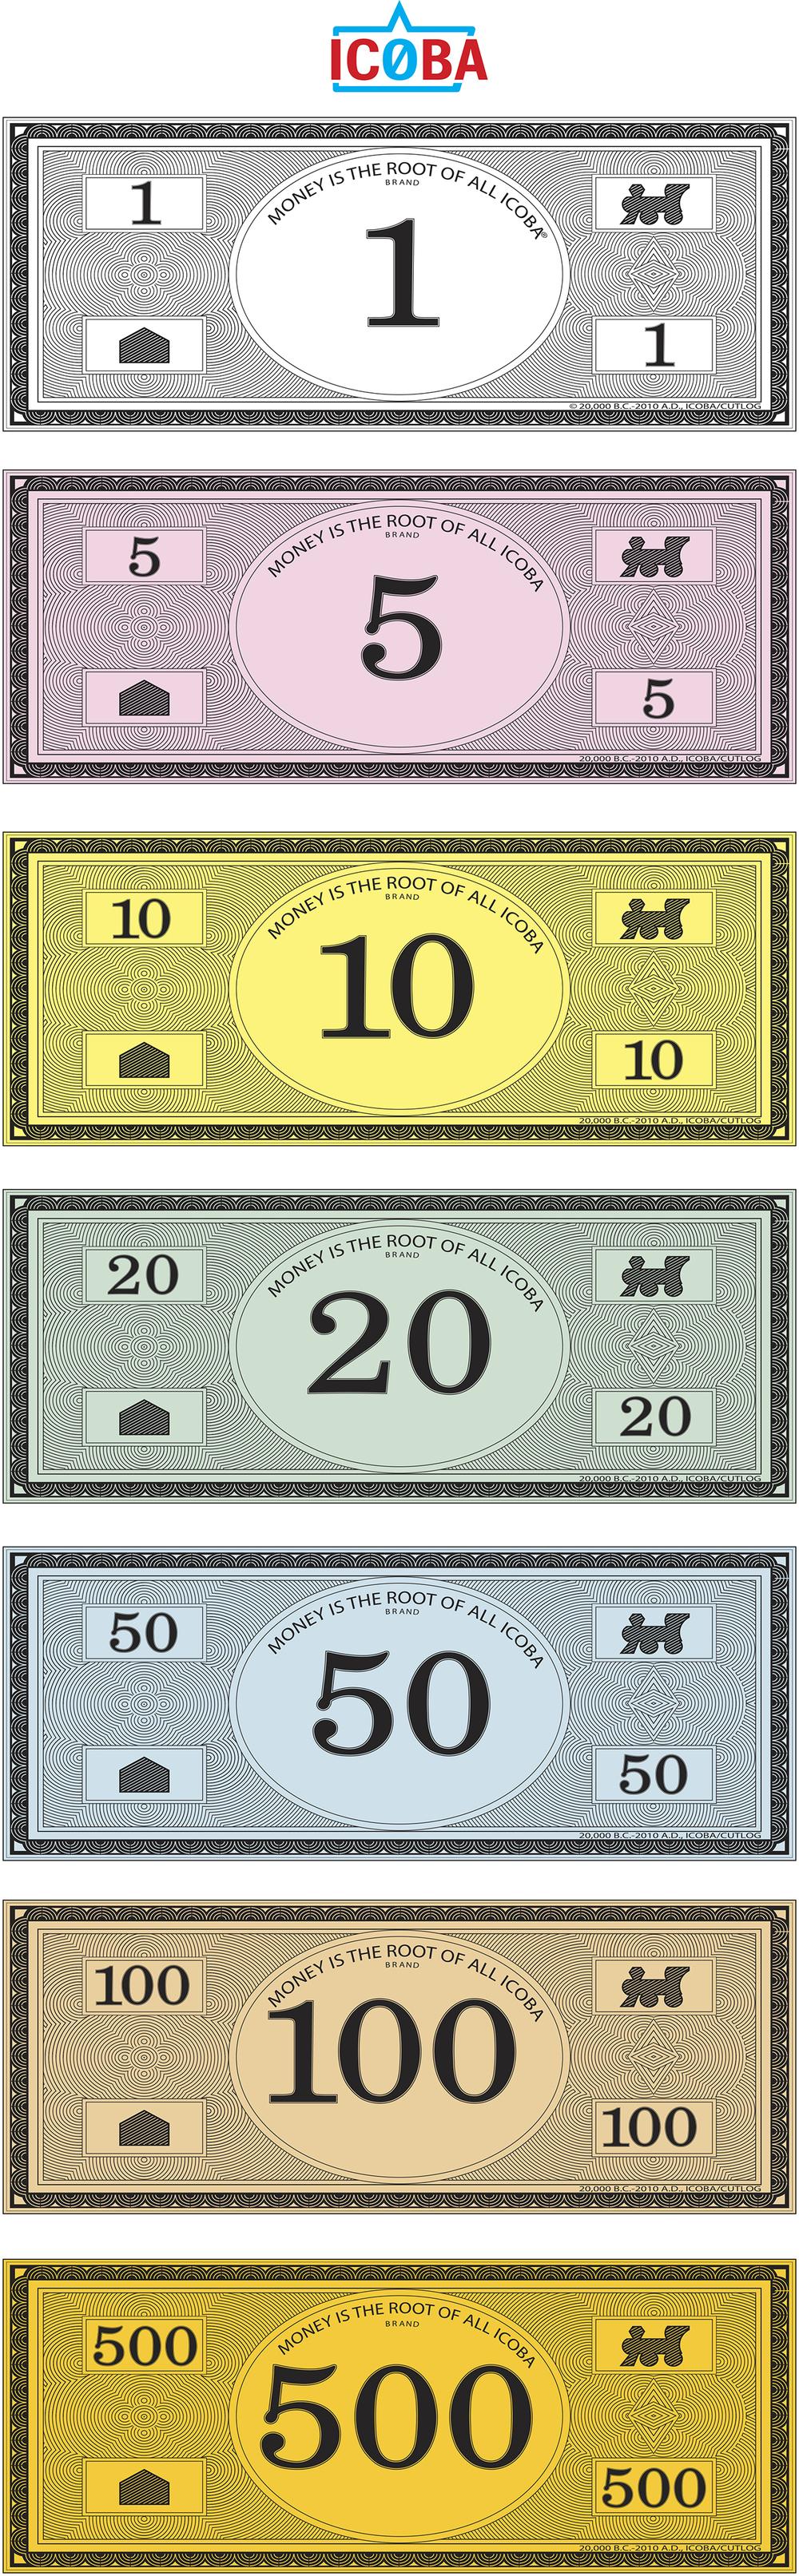 ICOBA_Monopoly 150_01.jpg